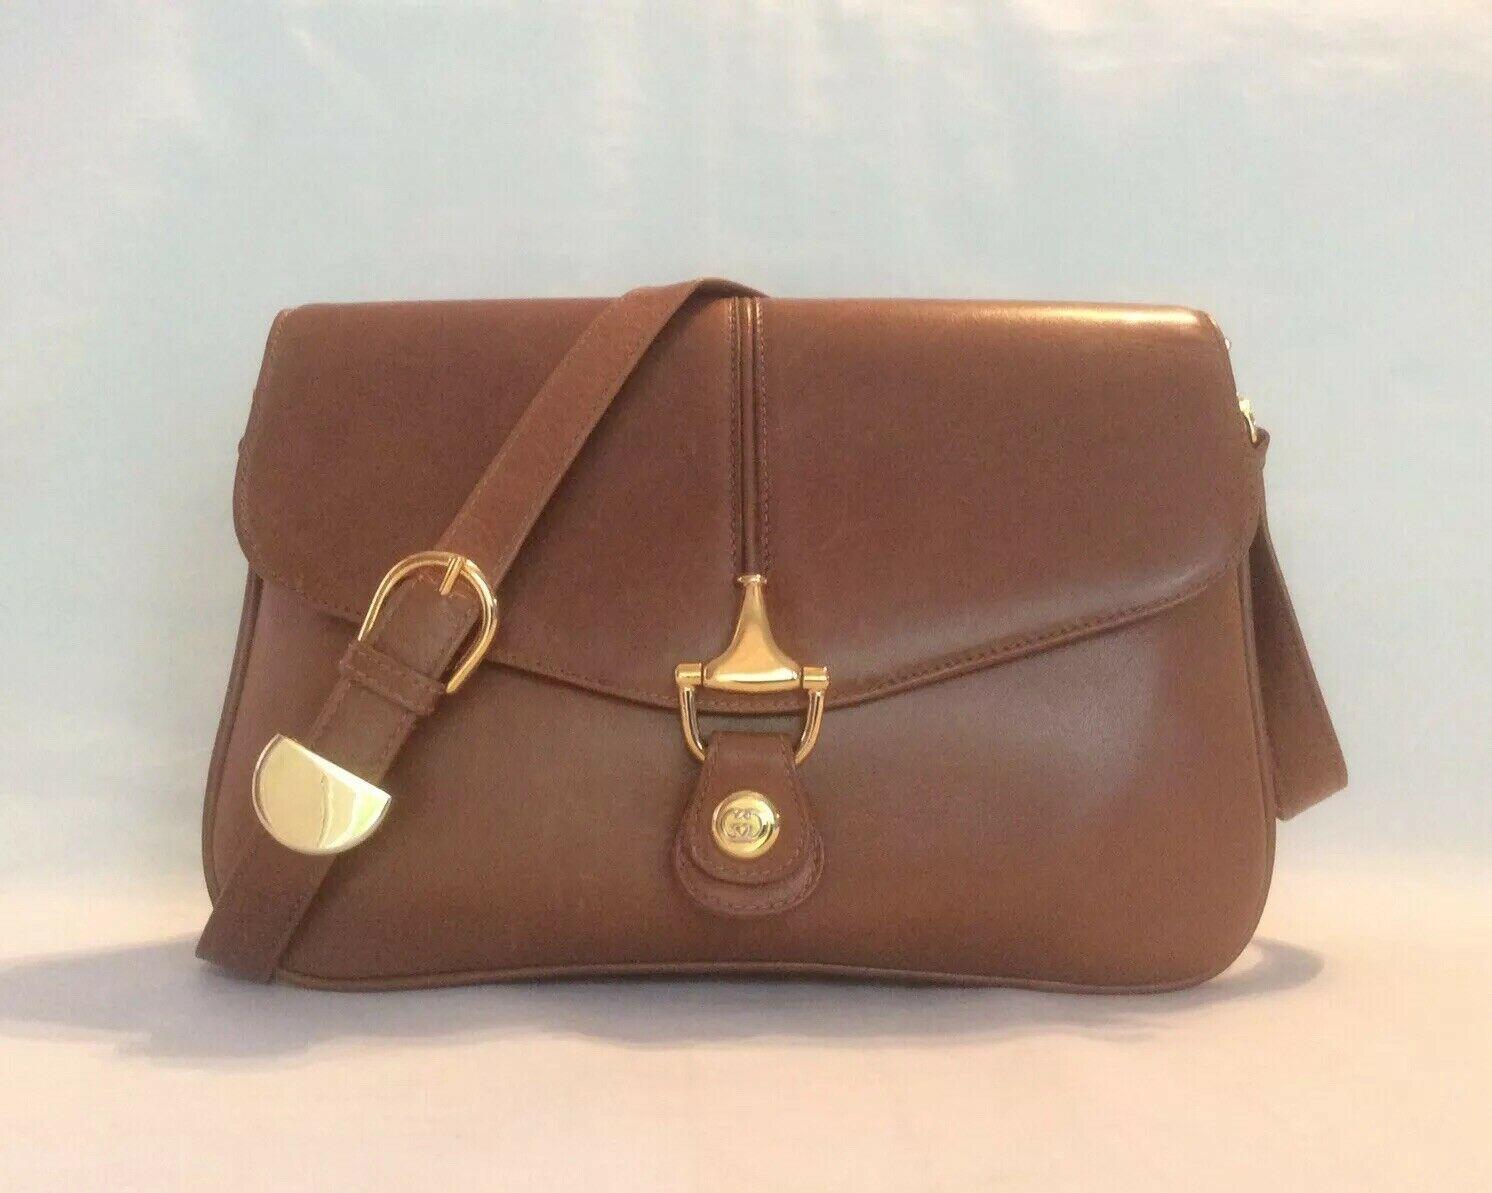 Forsale Vintage Original Gucci Nocciola Calf Leather Gusset Horsebit Shoulder Bag Italy Gucci Calf Leather Bags Brown Shoulder Bag